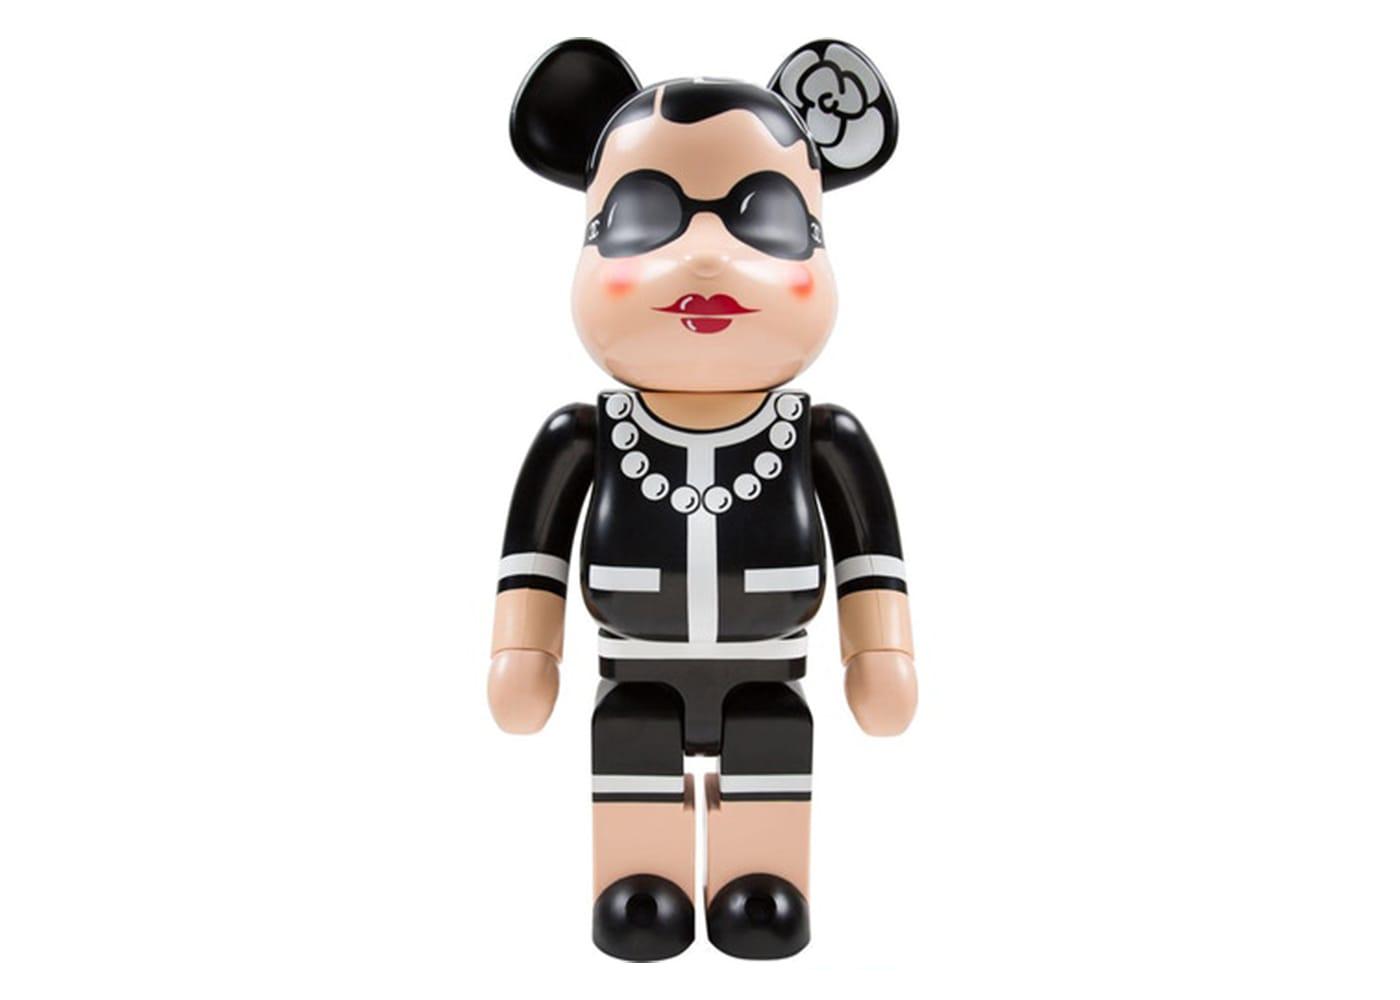 Coco Chanel 1000 Bearbrick